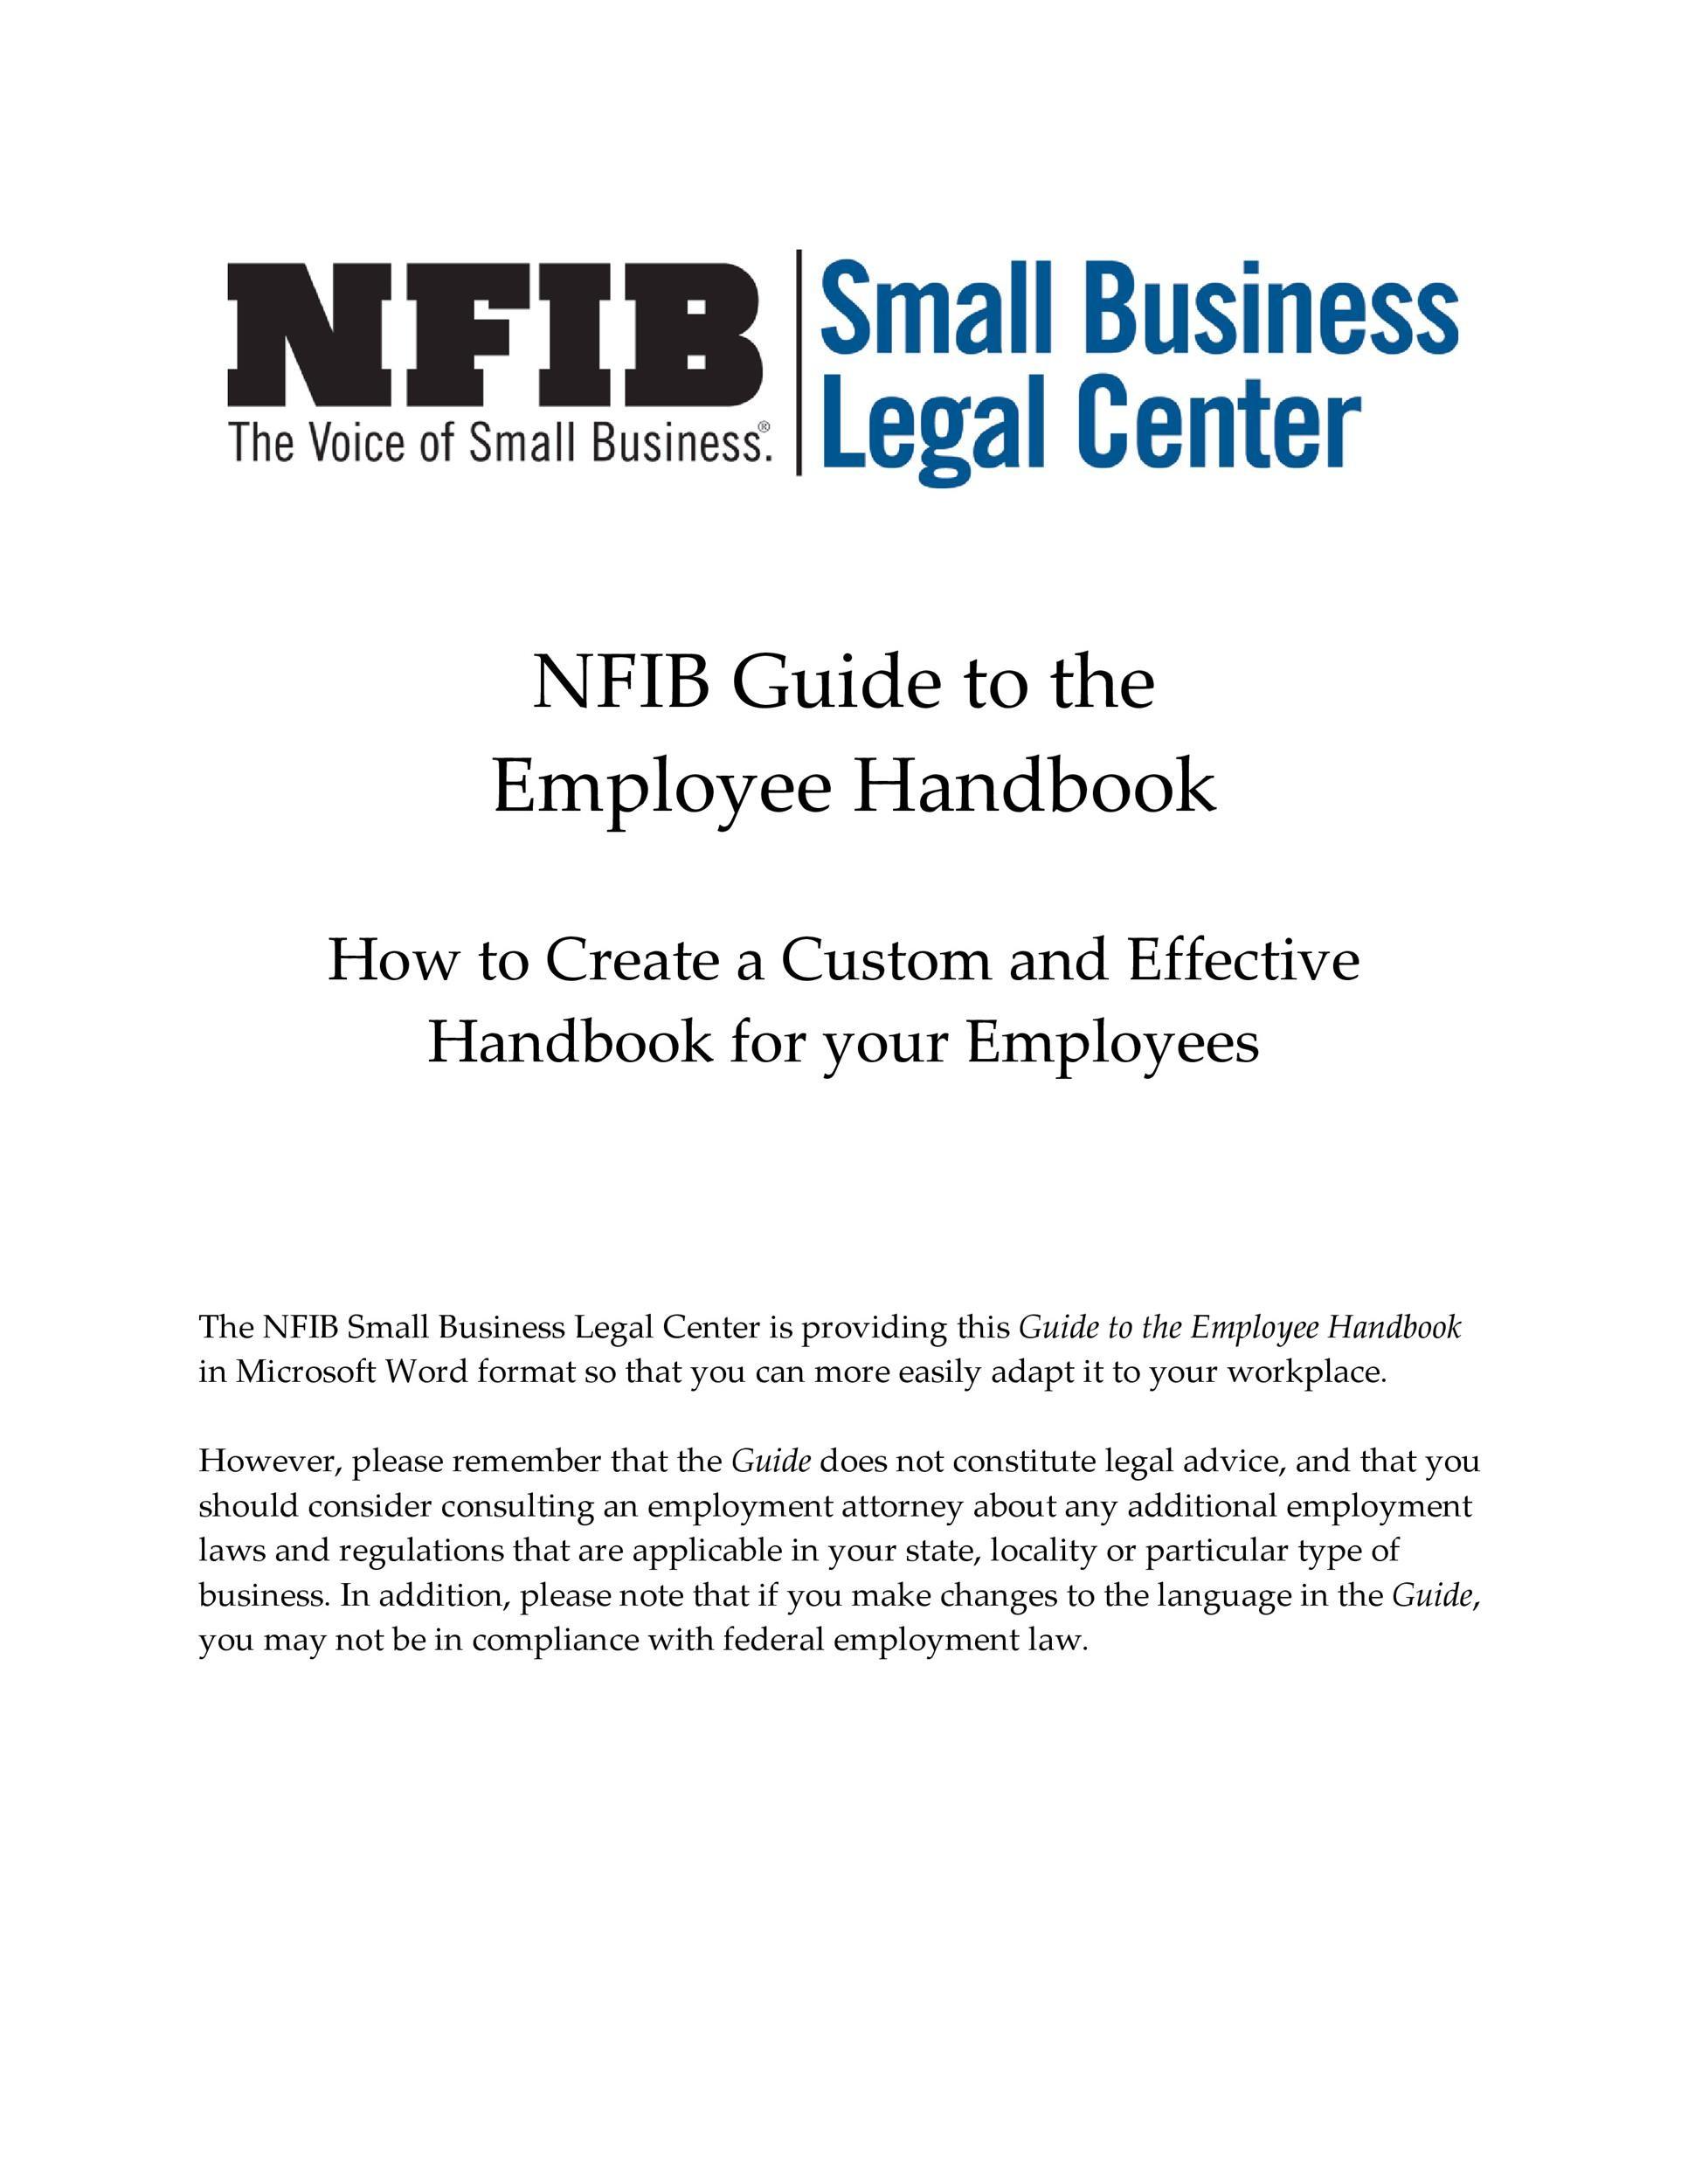 Employee Handbook Template Microsoft Word from templatelab.com